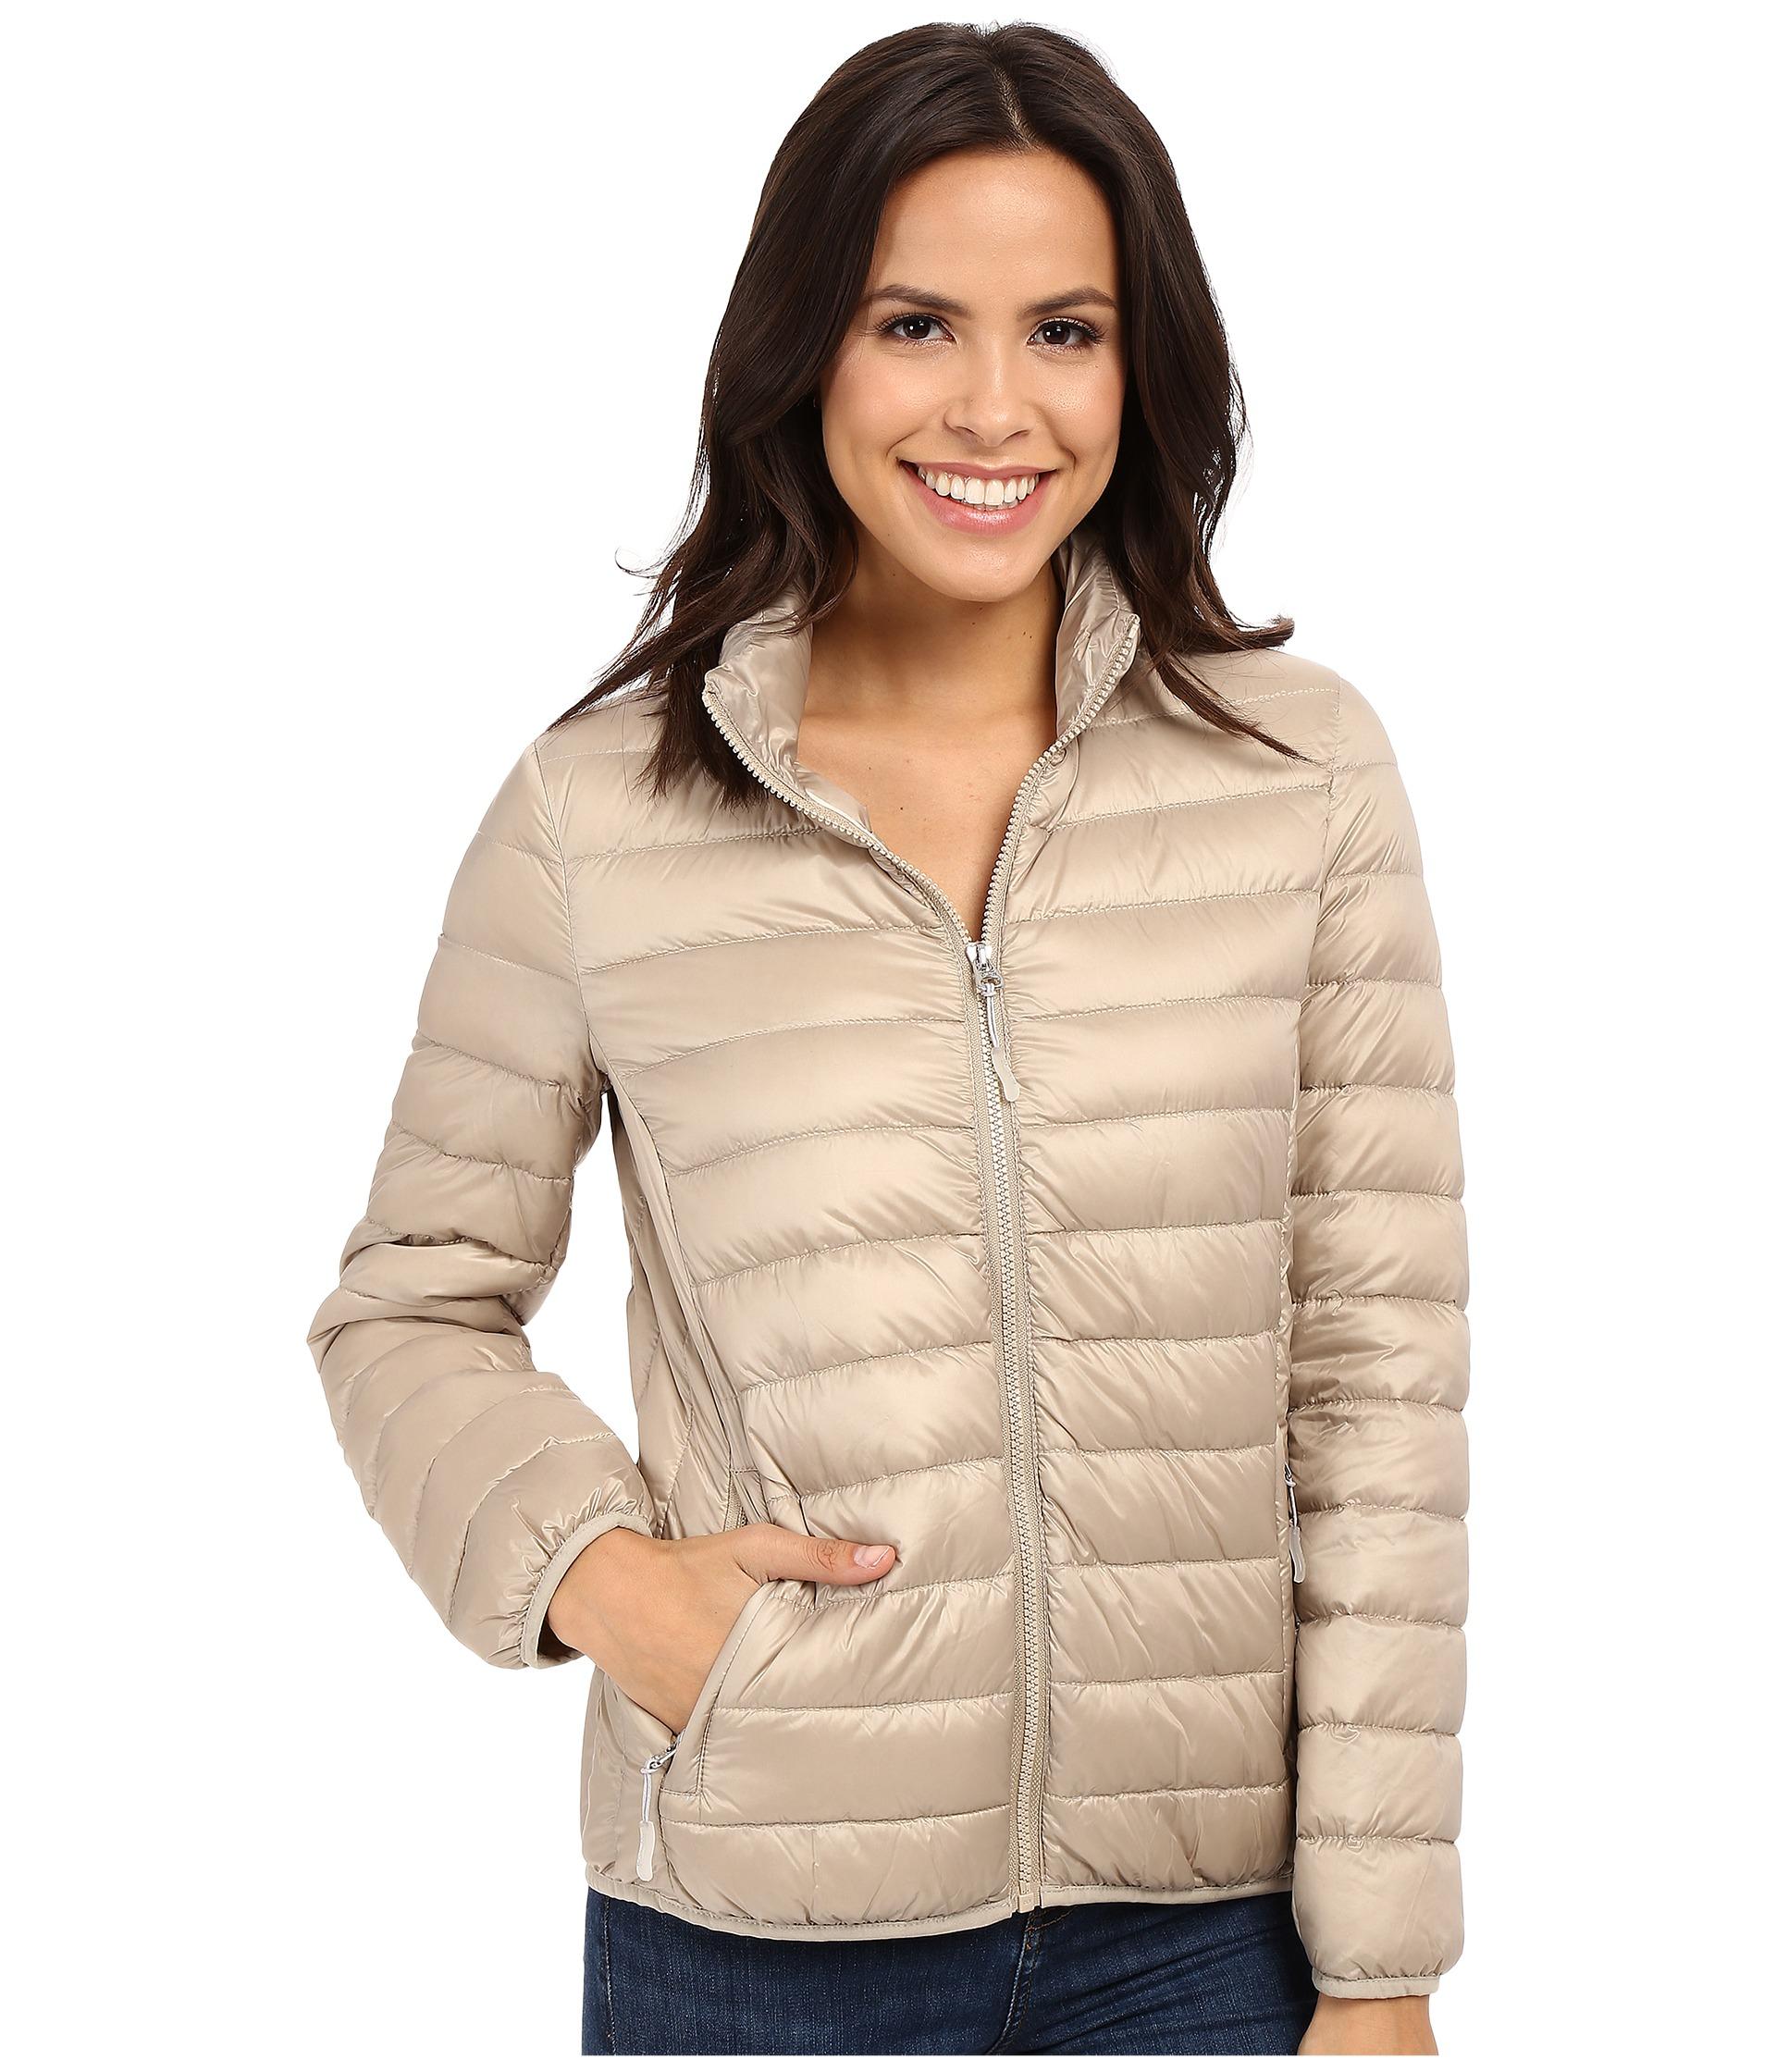 711e689b58c Women's Natural Clairmont Packable Travel Puffer Jacket